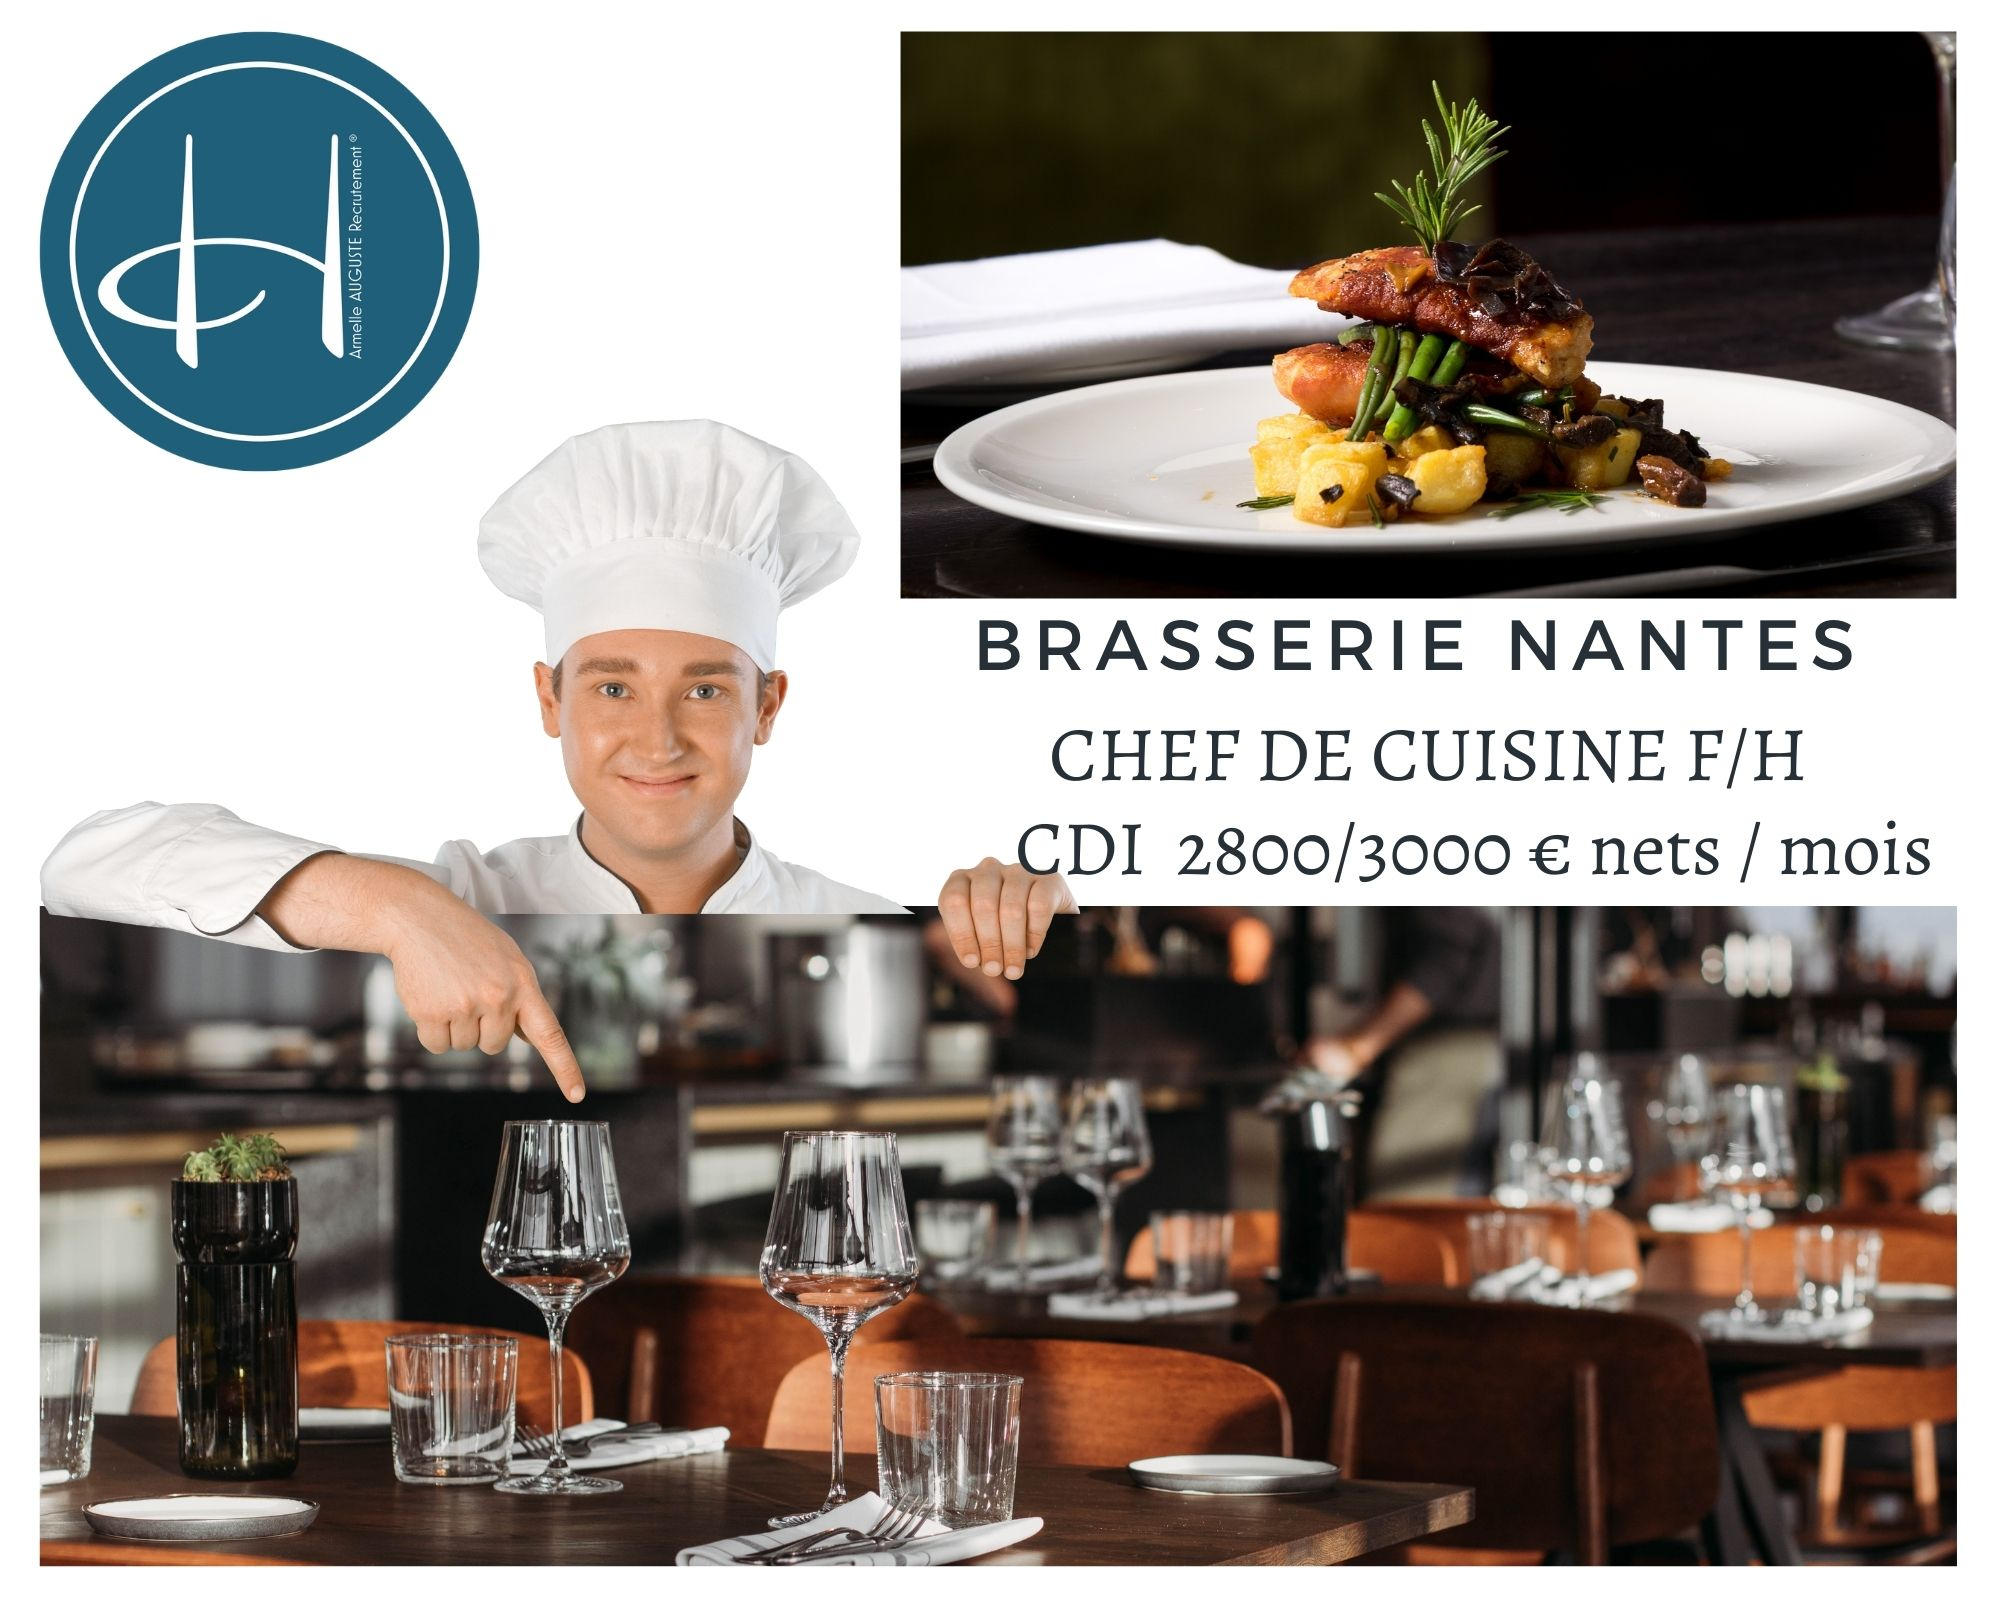 Recrutement: Chef de cuisine Brasserie F/H chez Armelle AUGUSTE Recrutement® à Nantes